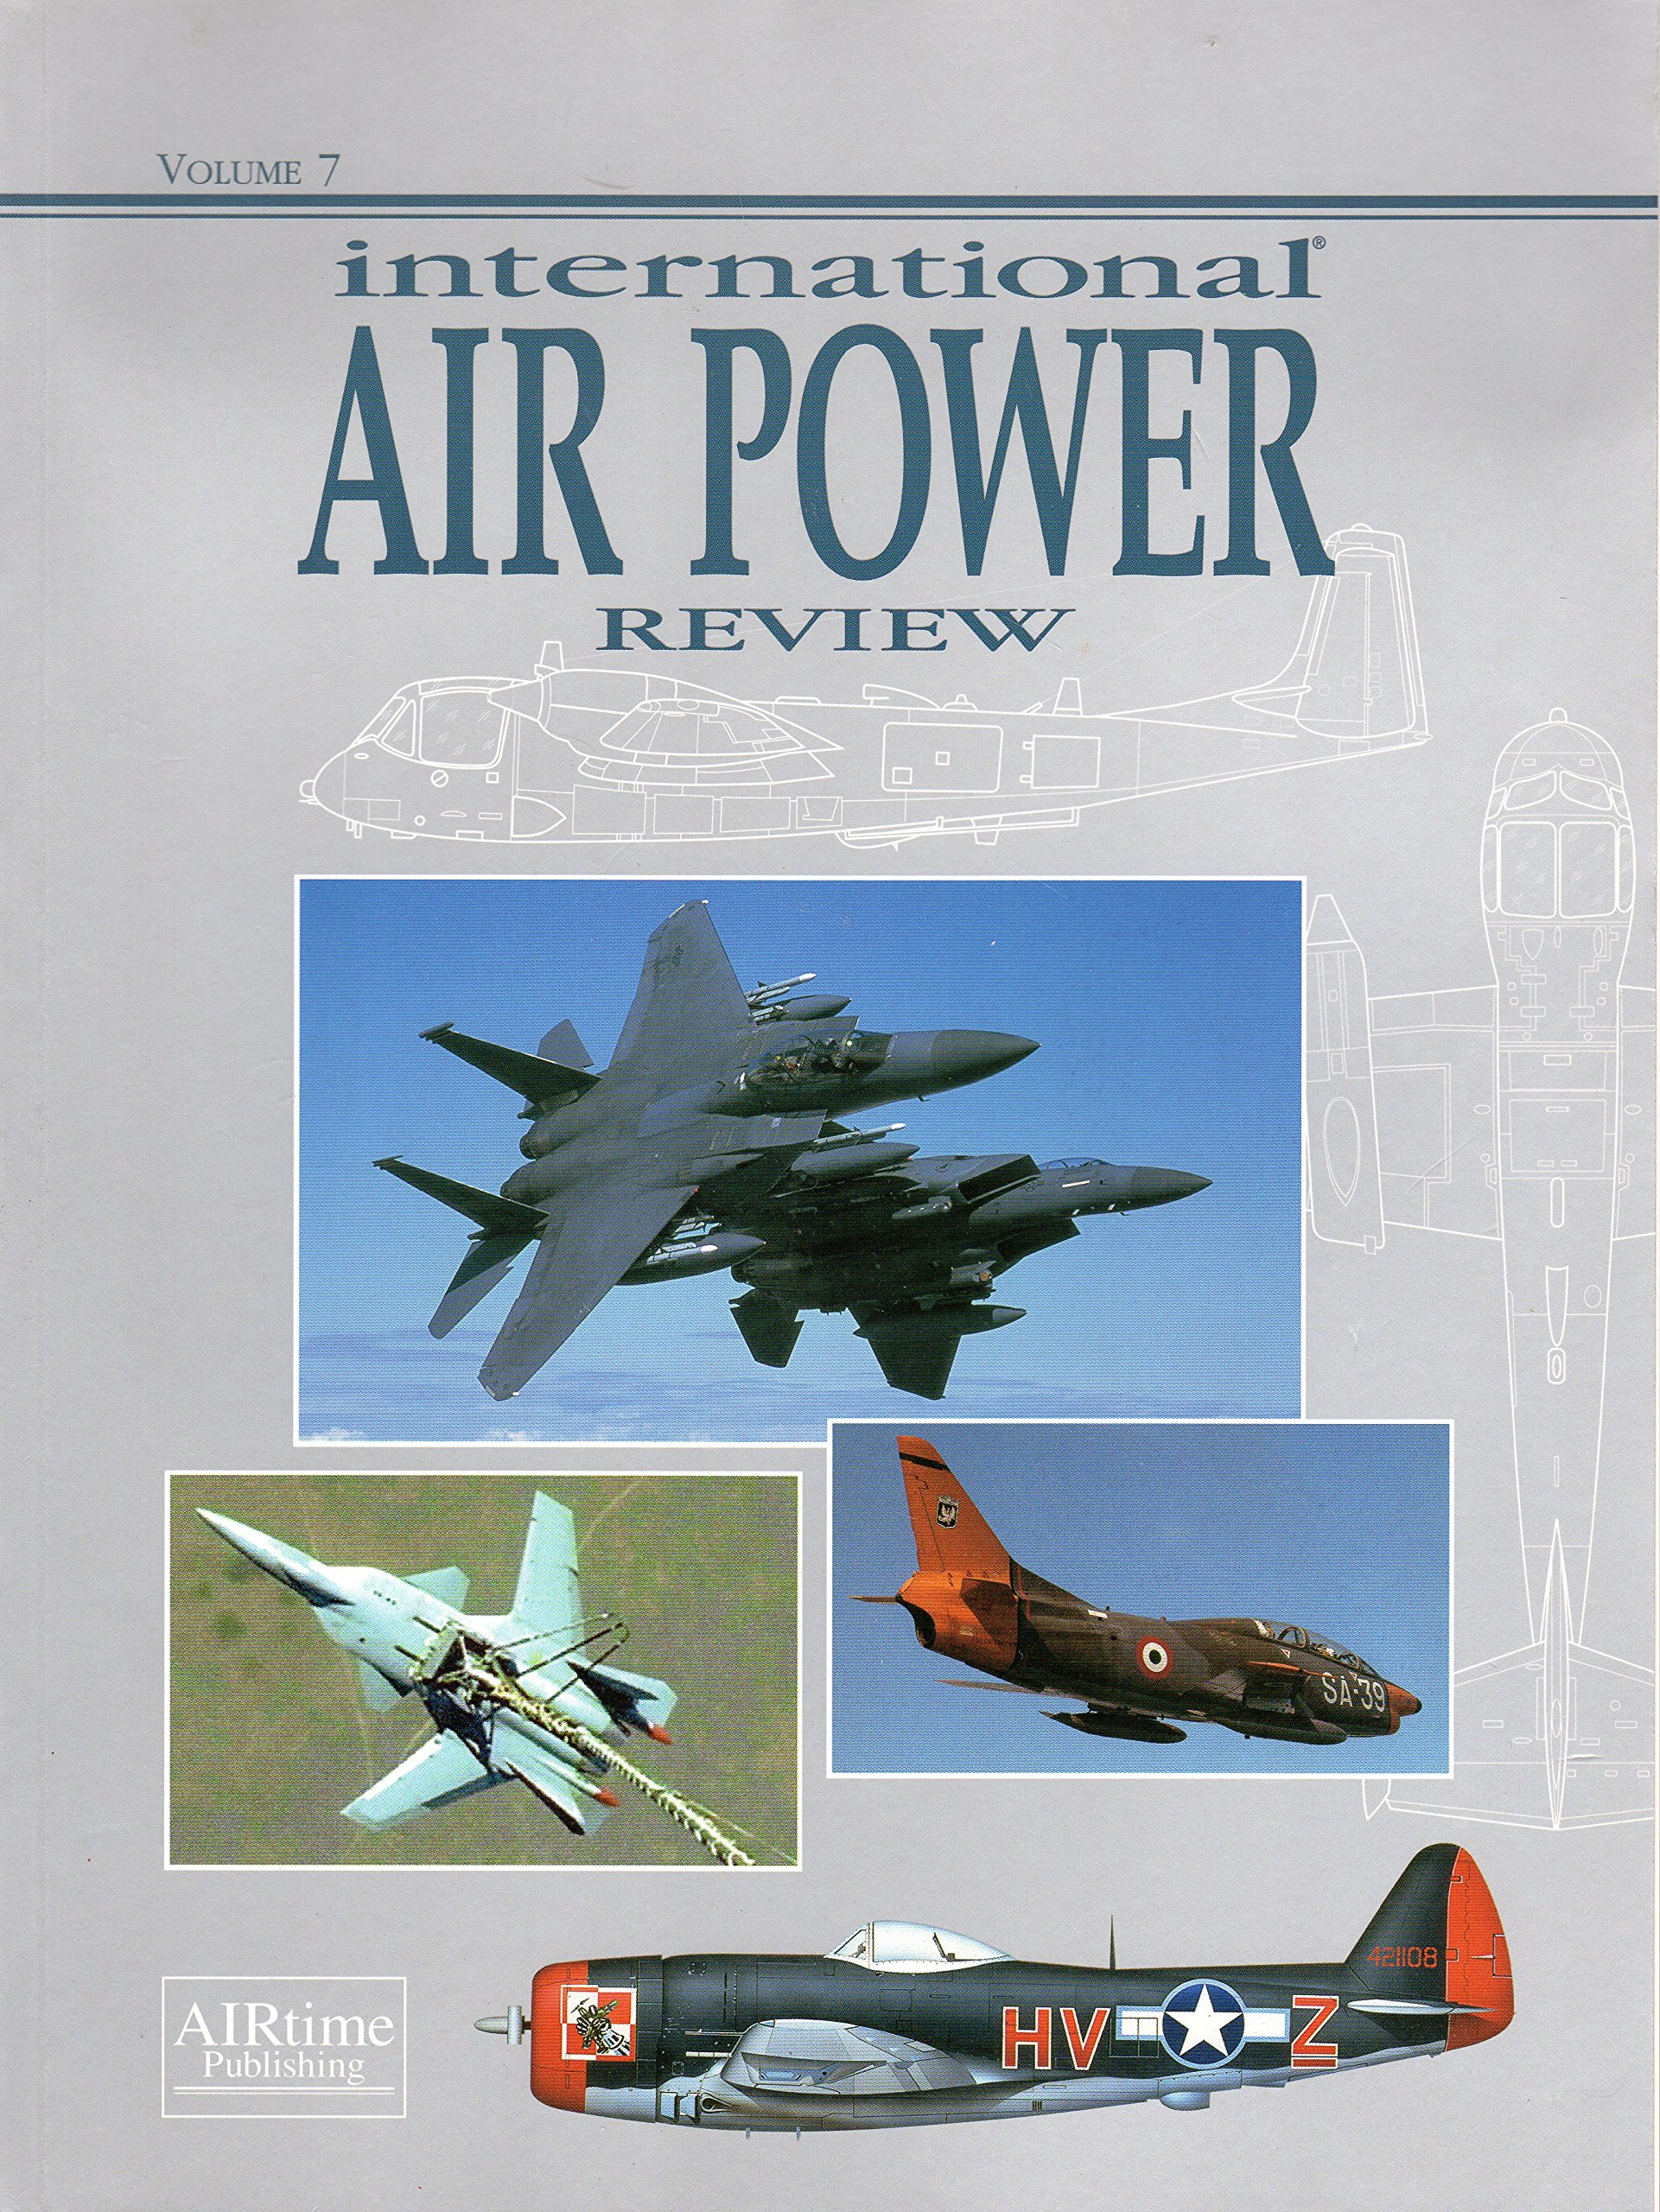 International Air Power Review, Vol. 7